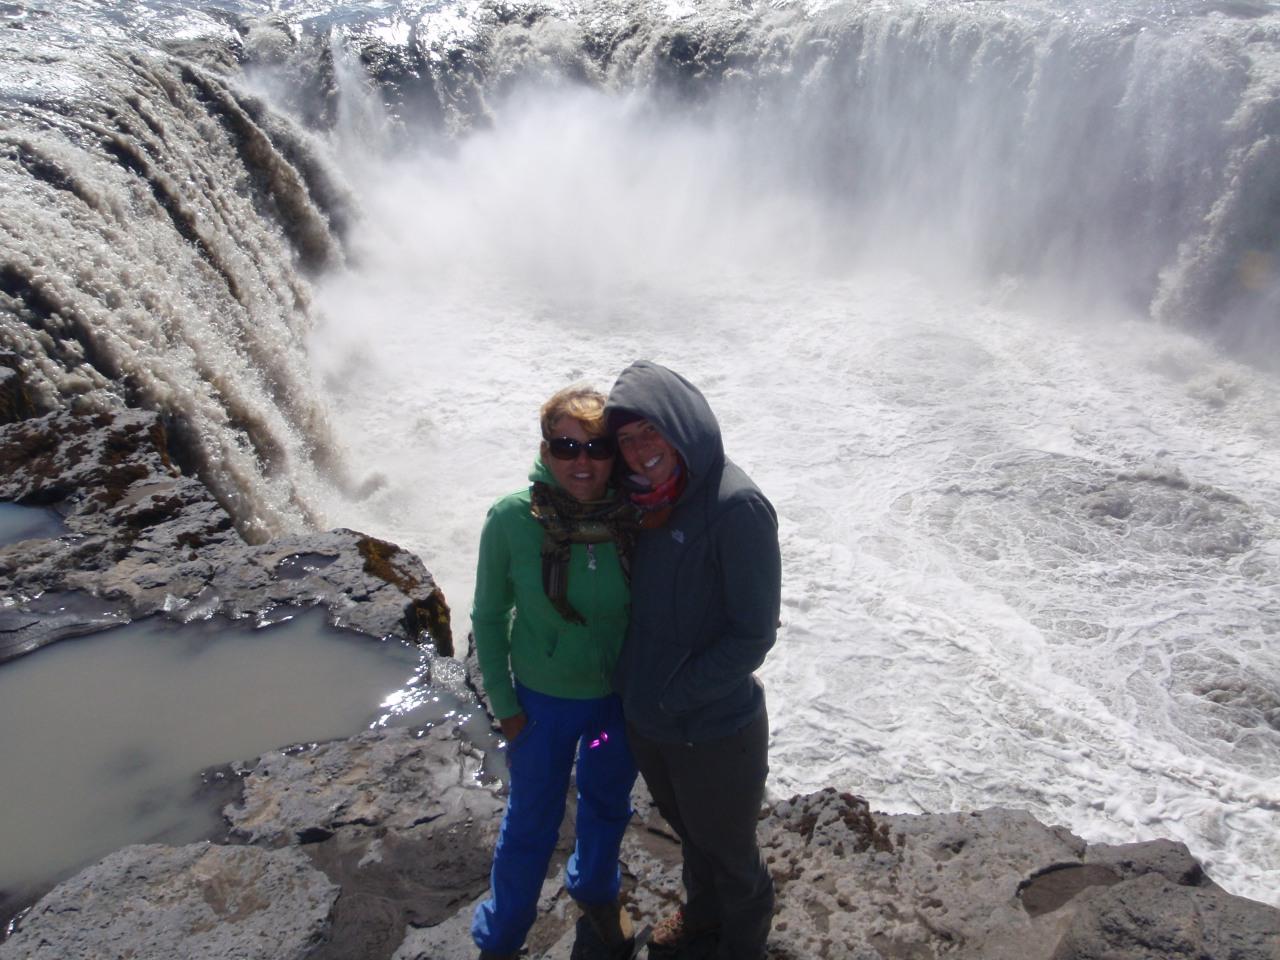 wolontariat europesjki, wolontariat na Islandii, Martyna Skura